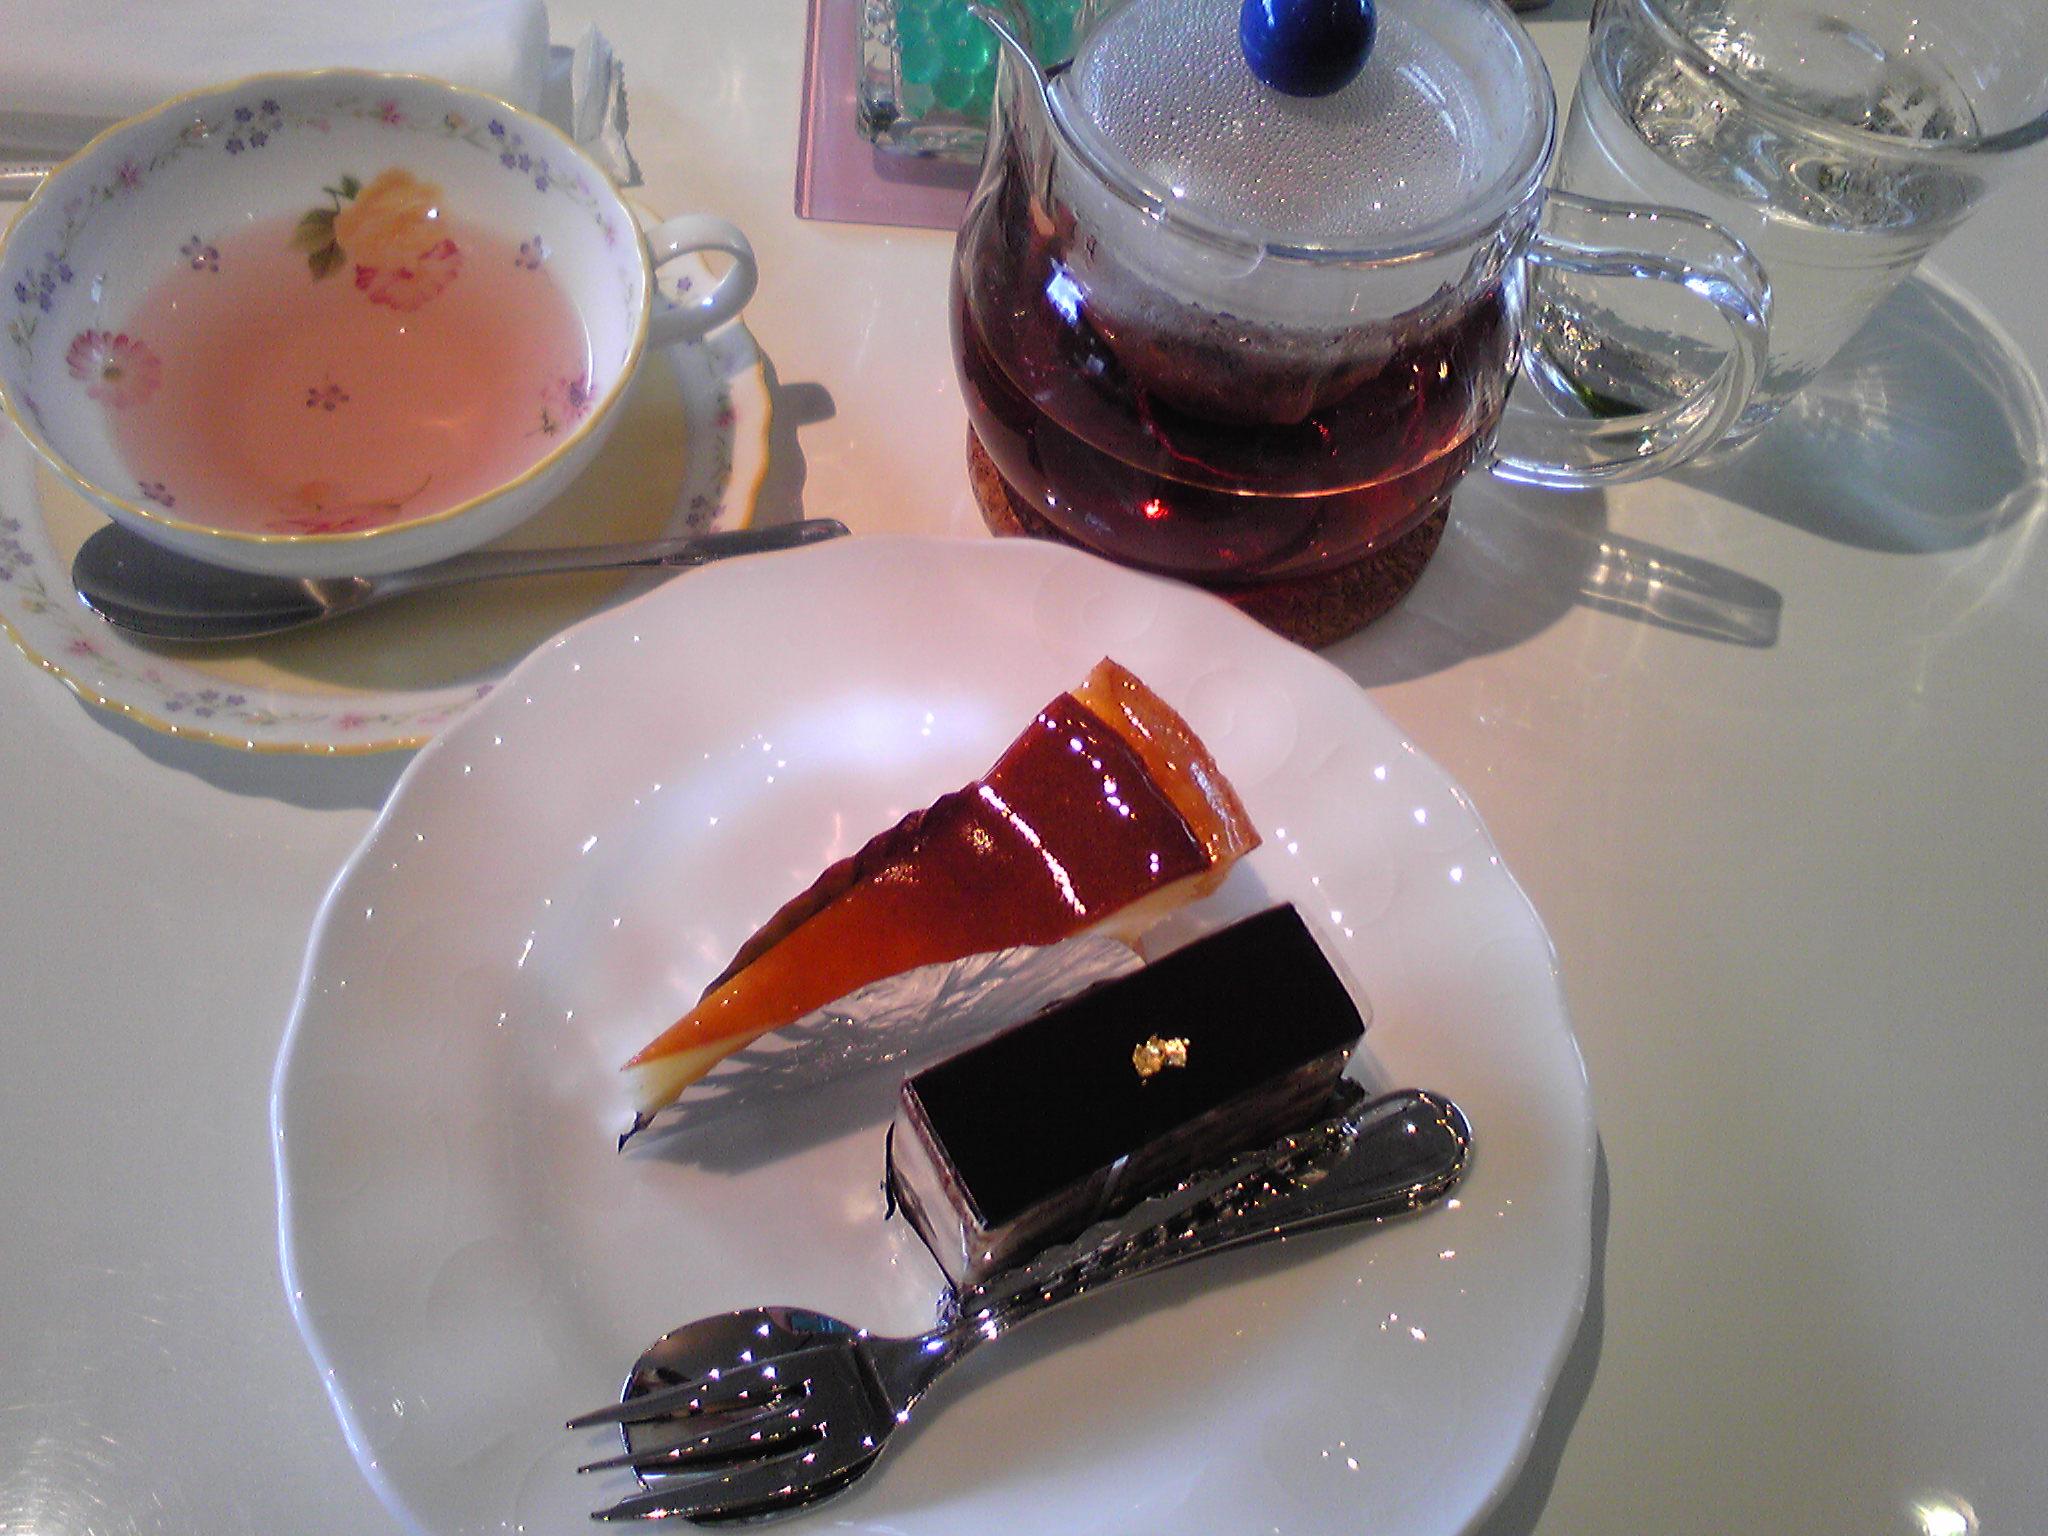 oranger B Cafe